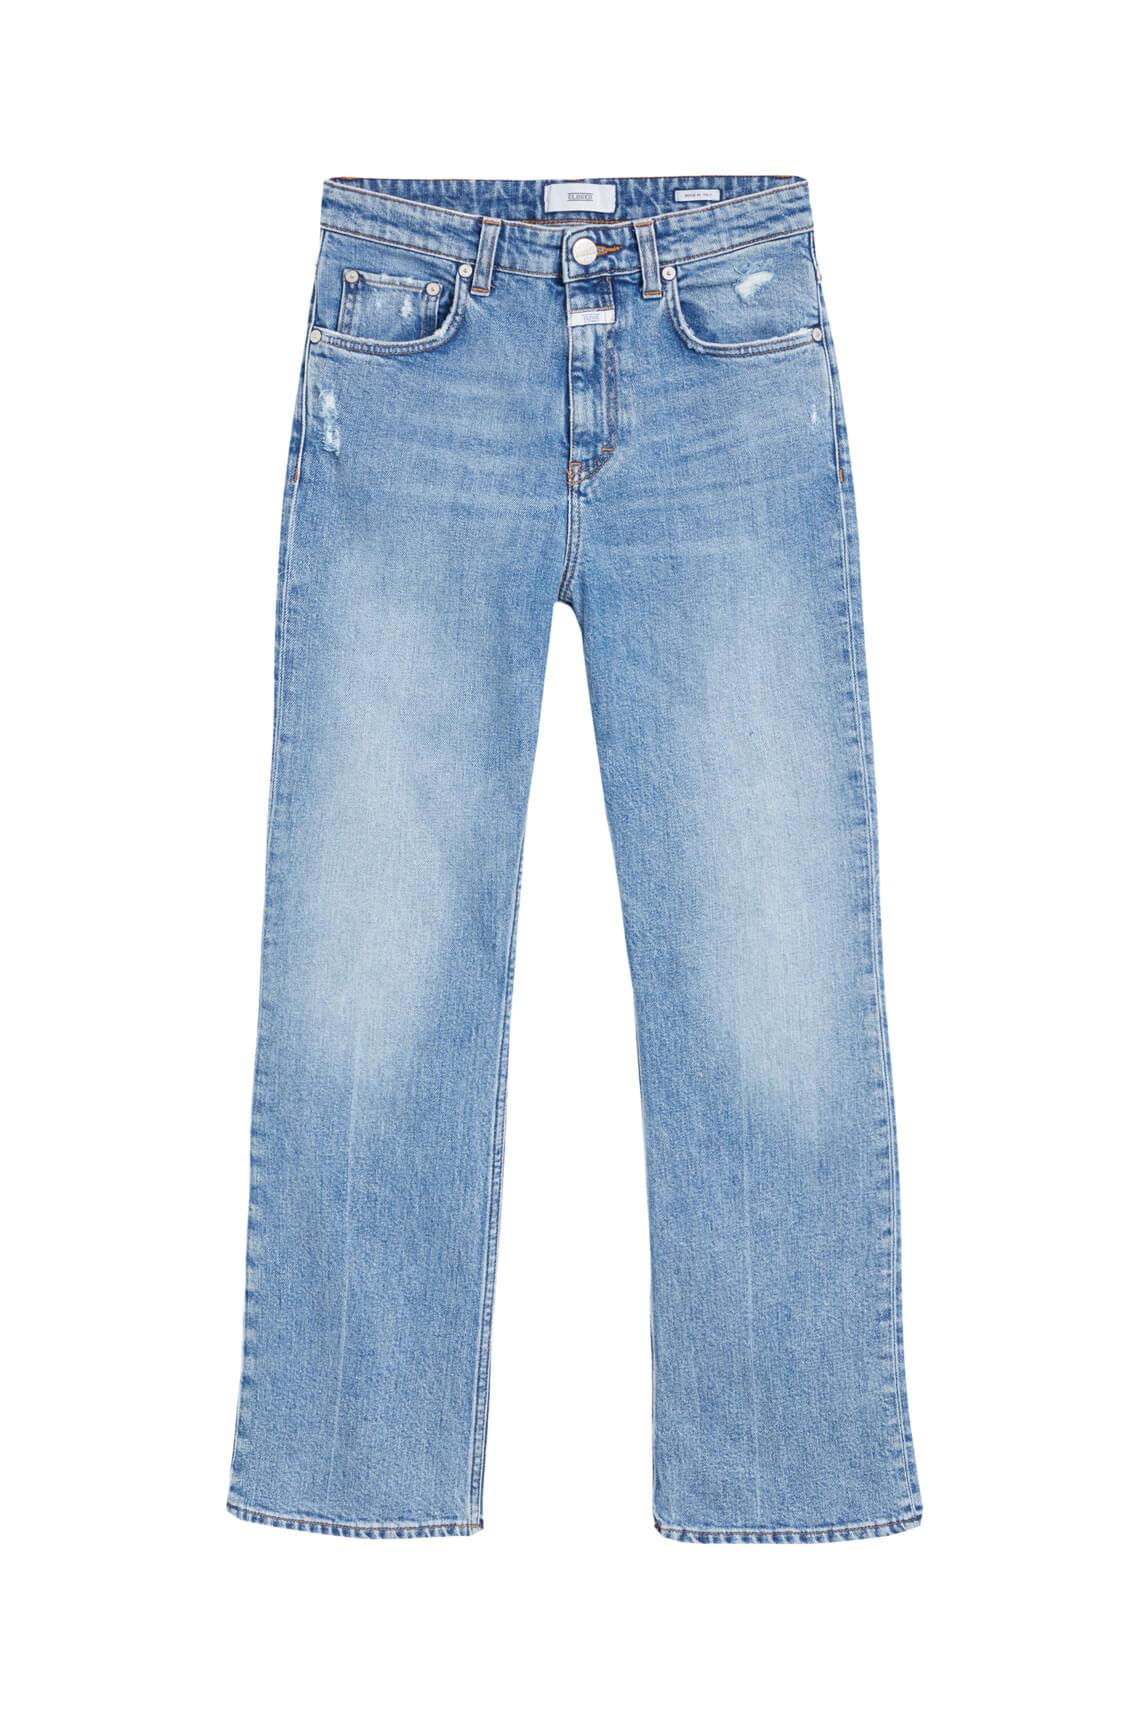 Closed Dames Jeans high waist Blauw